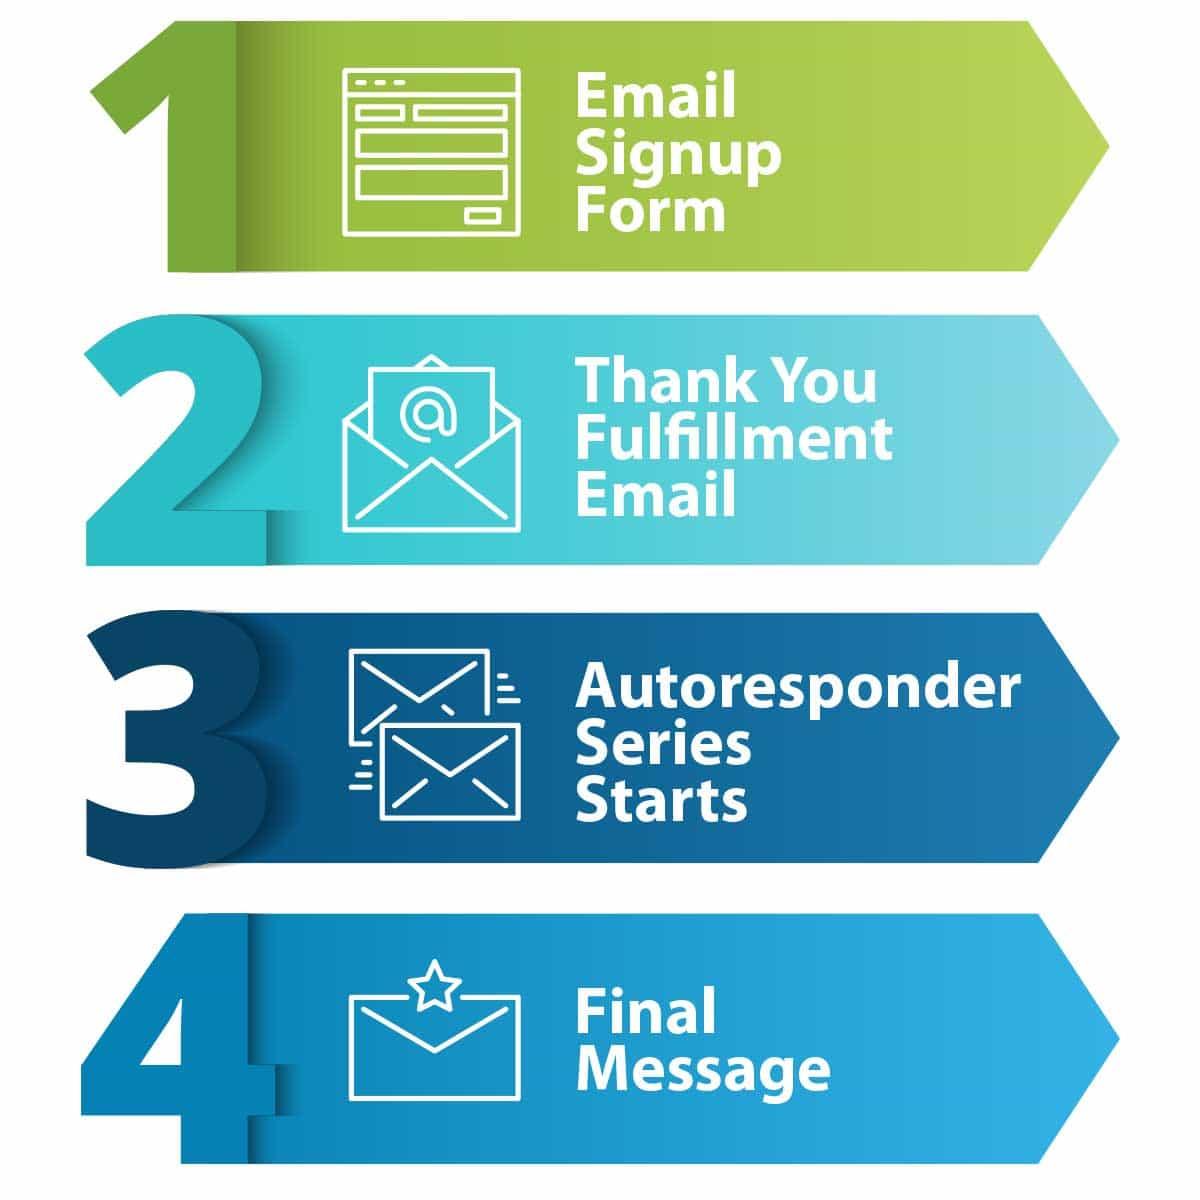 Autoresponder Series Steps